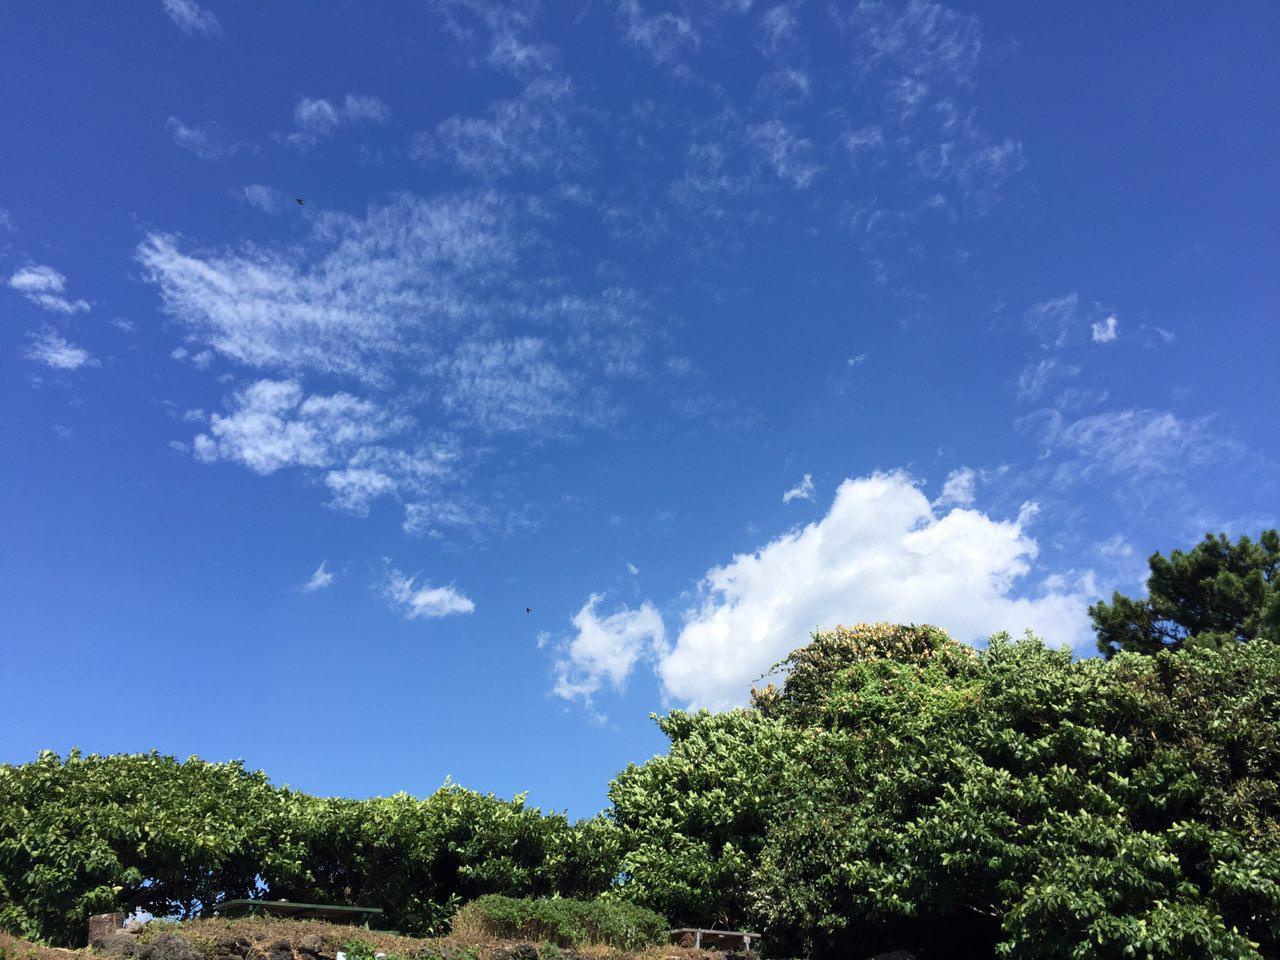 photo_2016-08-30_15-41-29.jpg